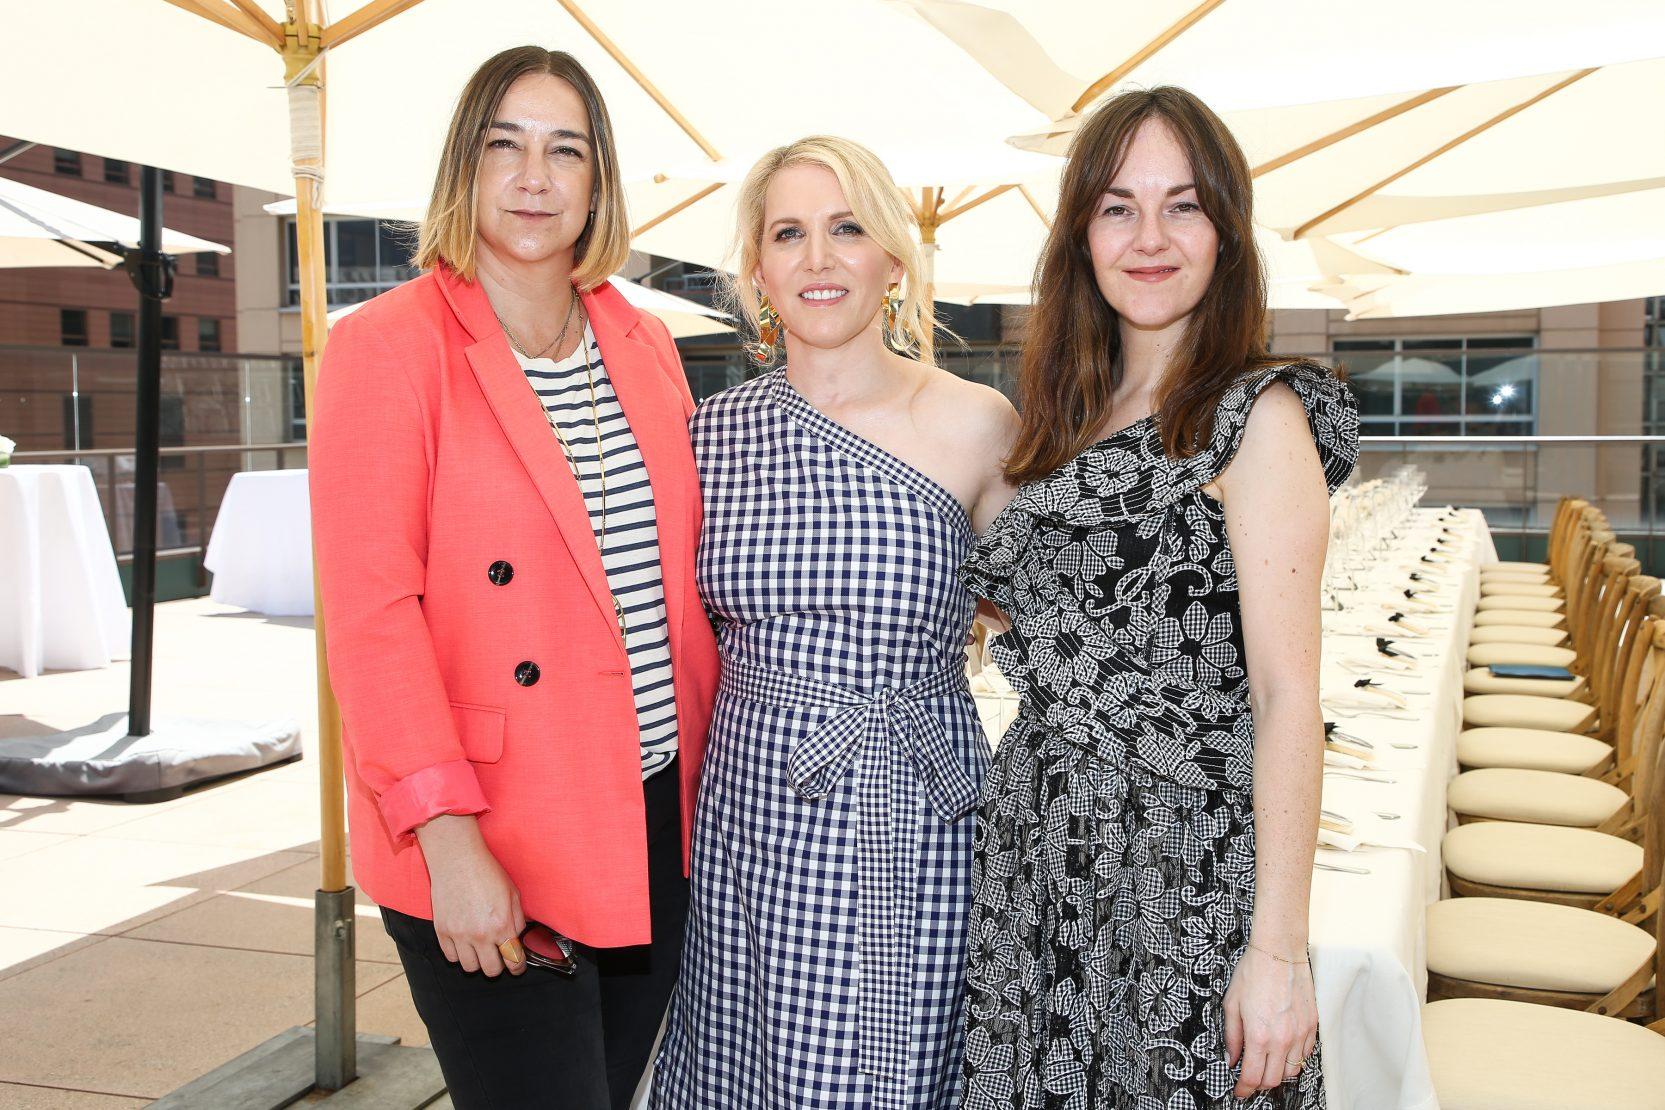 Lupe Puerta, Shari Glazer and Lauren Elrick